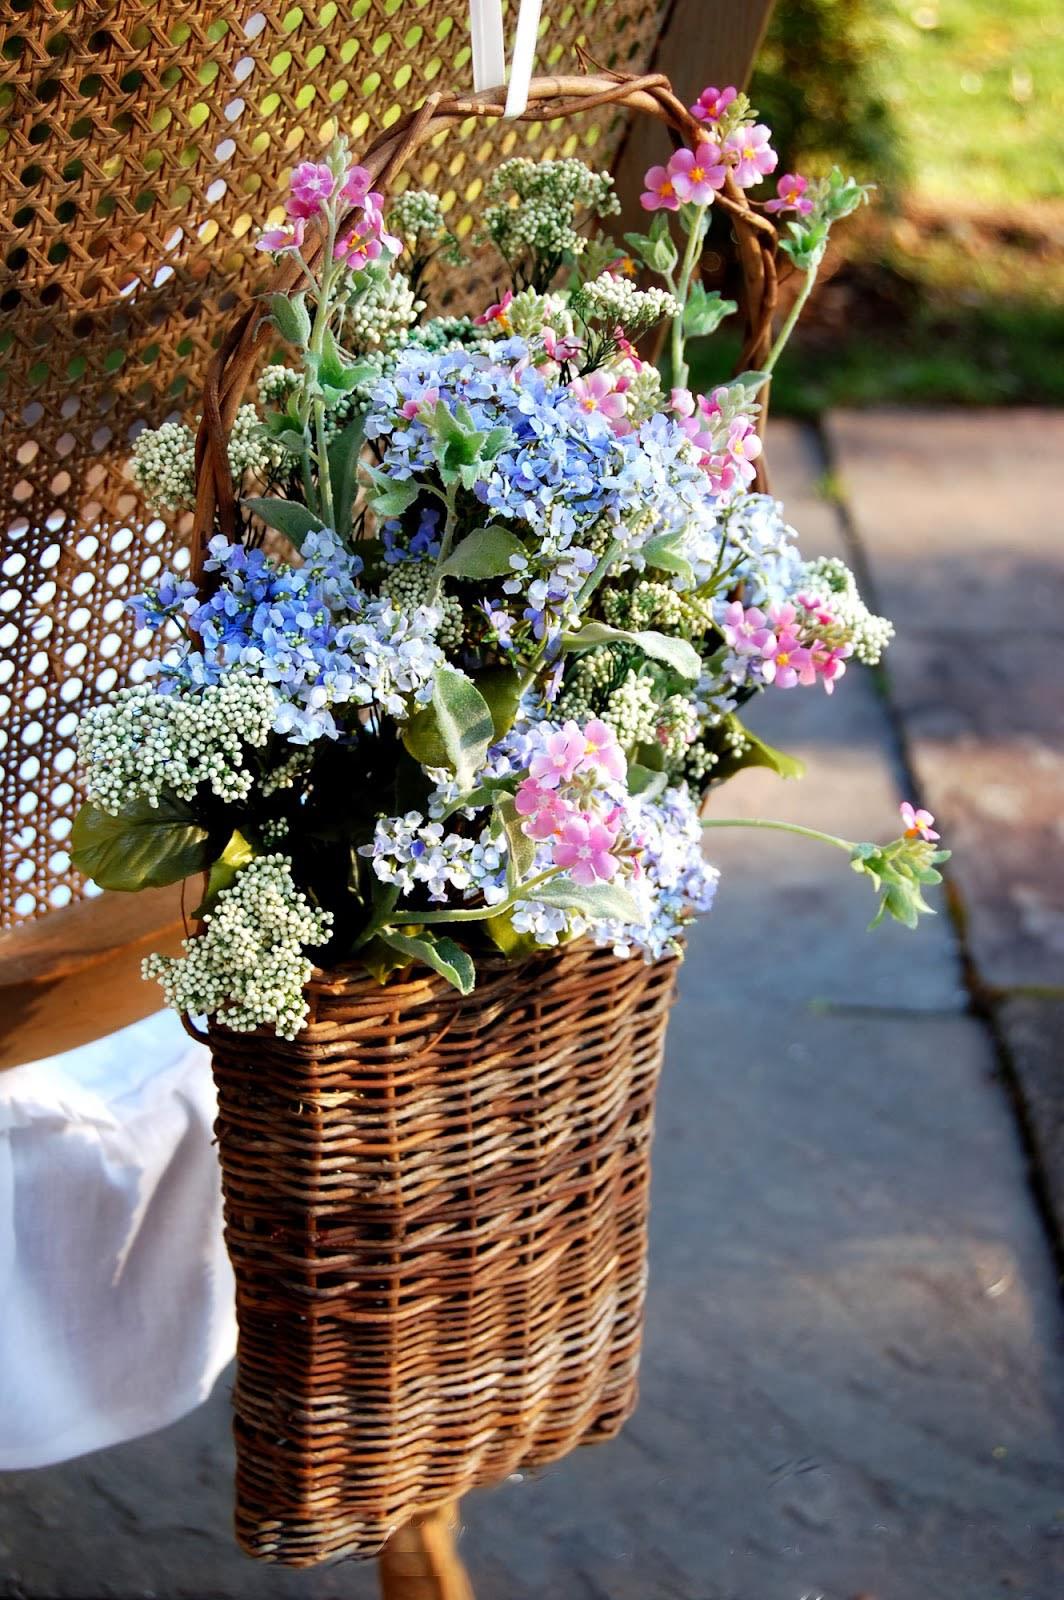 Flower Baskets Hd : Flowers baskets hd wallpapers free download unique